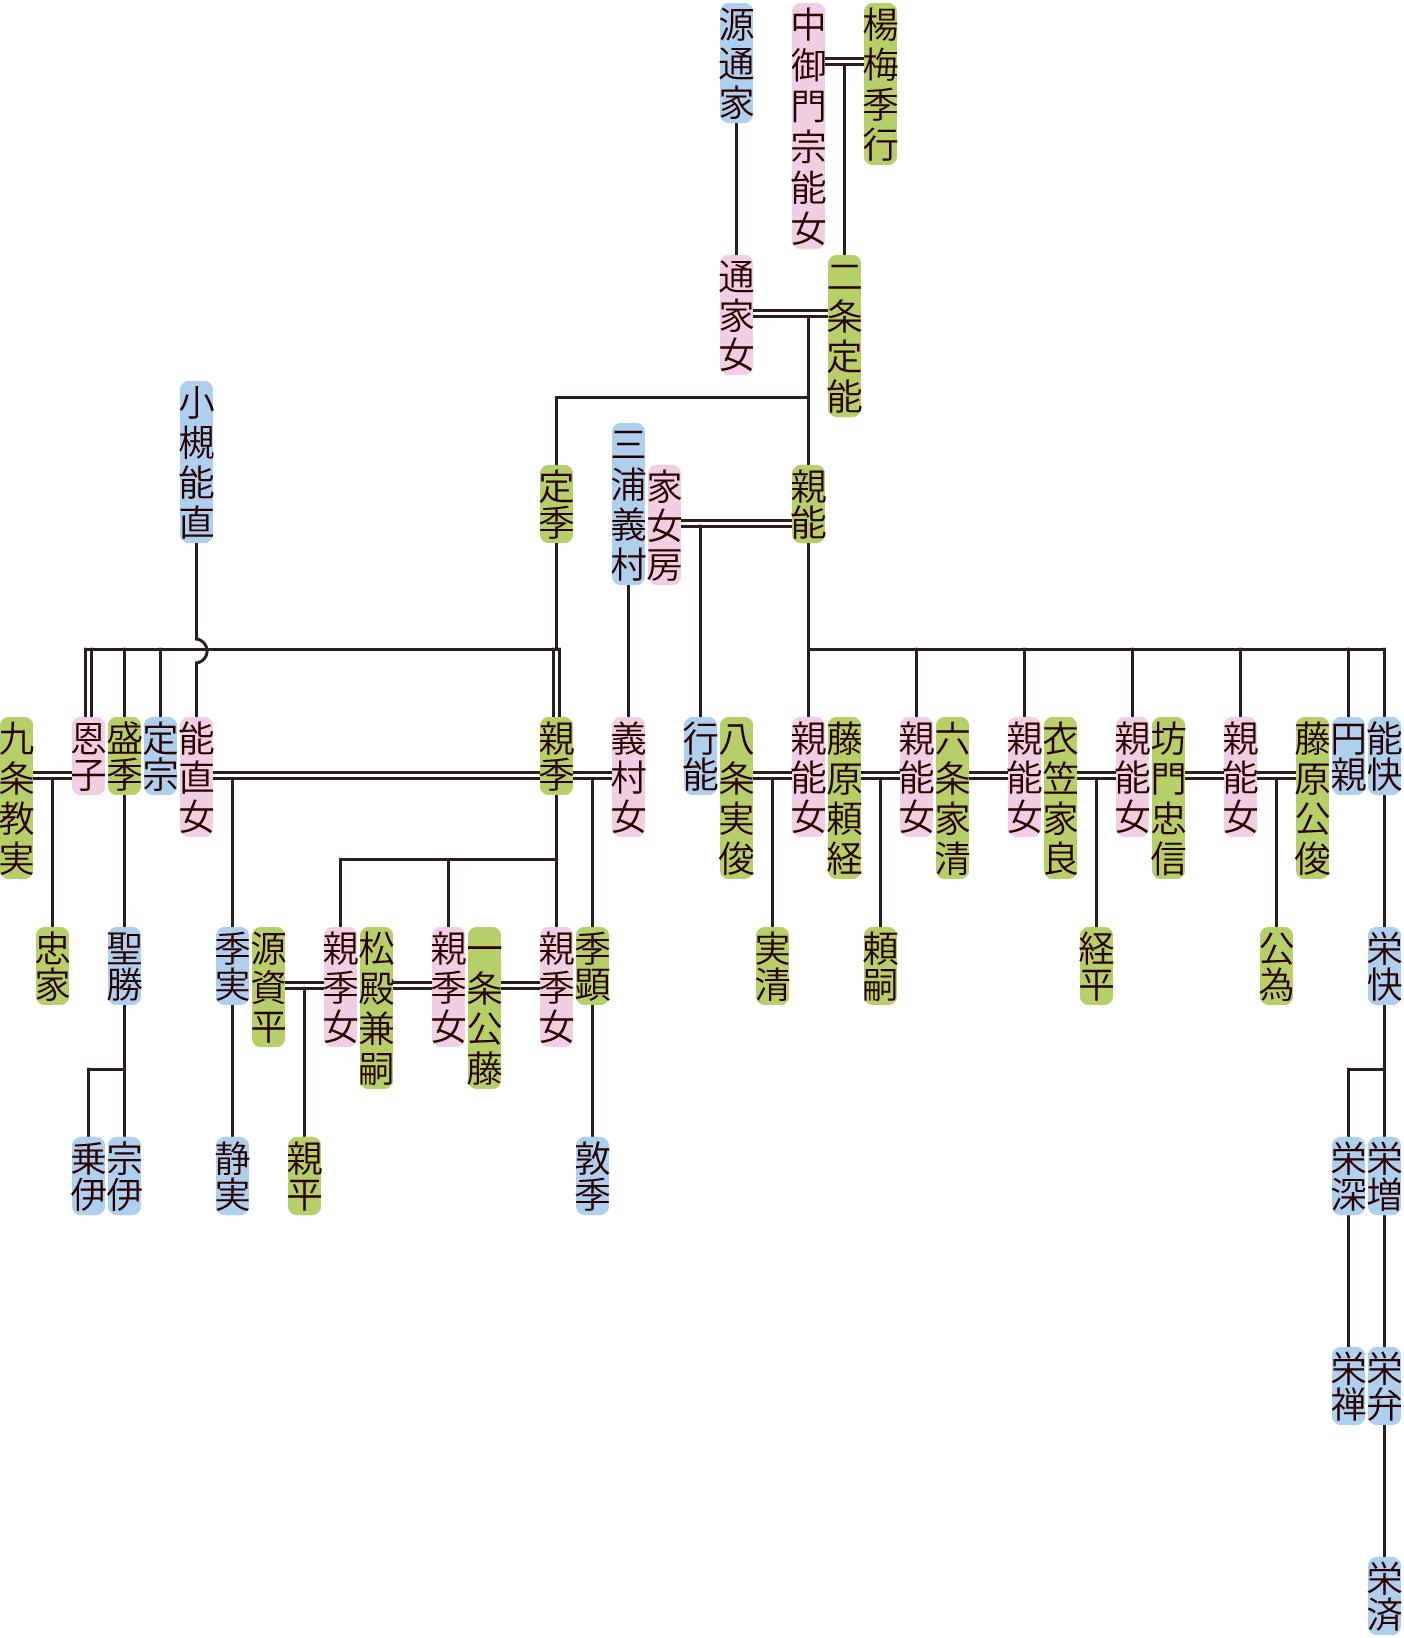 藤原親能・定季の系図